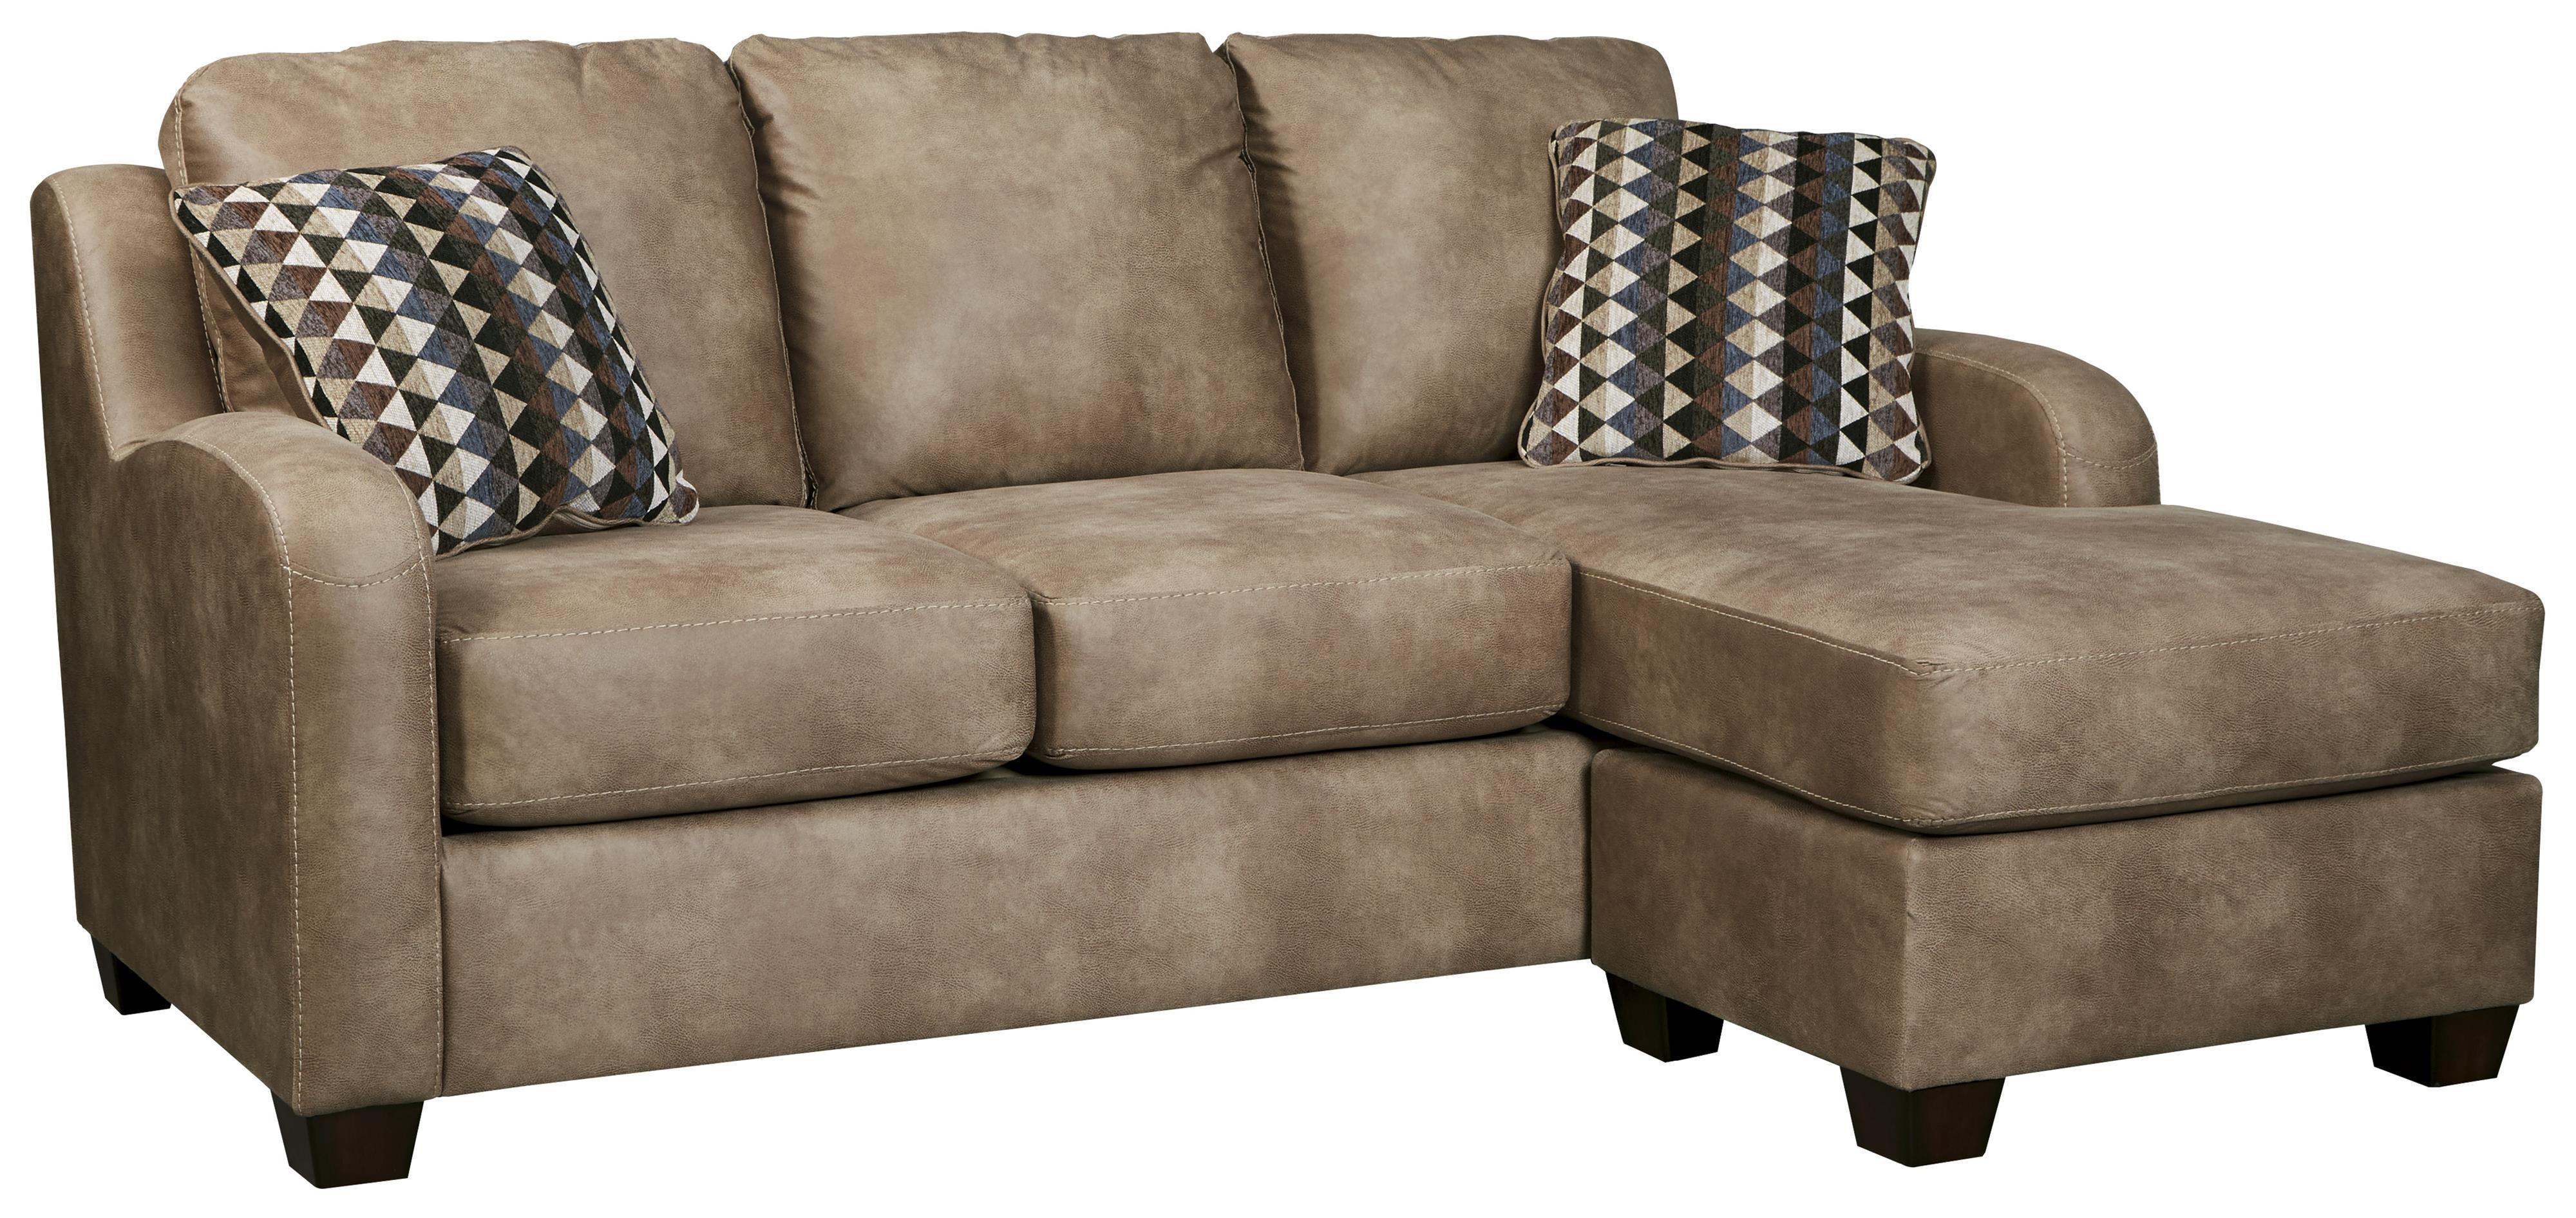 Del sol ab alturo 6000318 contemporary faux leather sofa - Apartment sofa with chaise ...